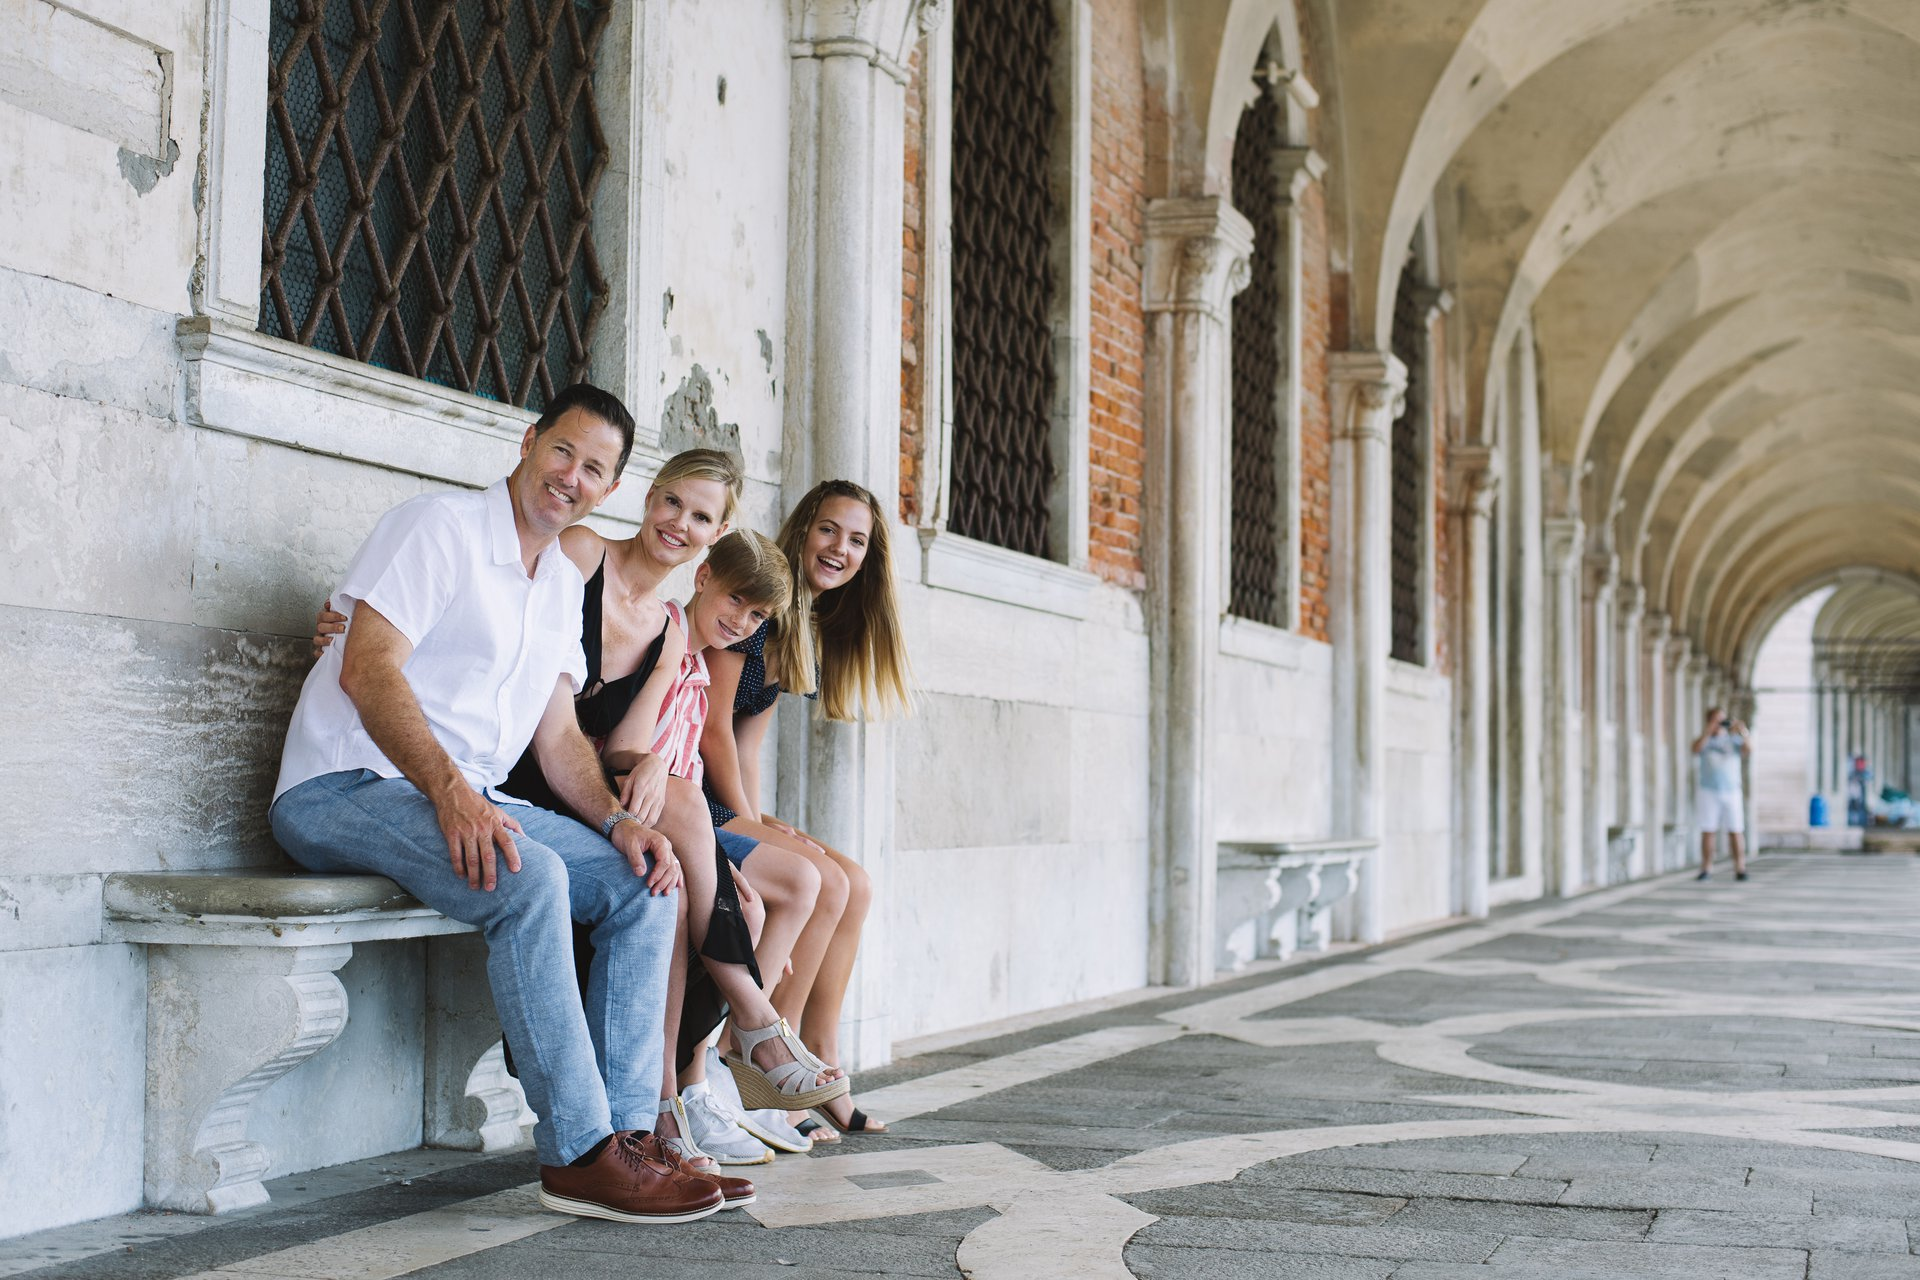 Venice-Italy-travel-story-Flytographer-25